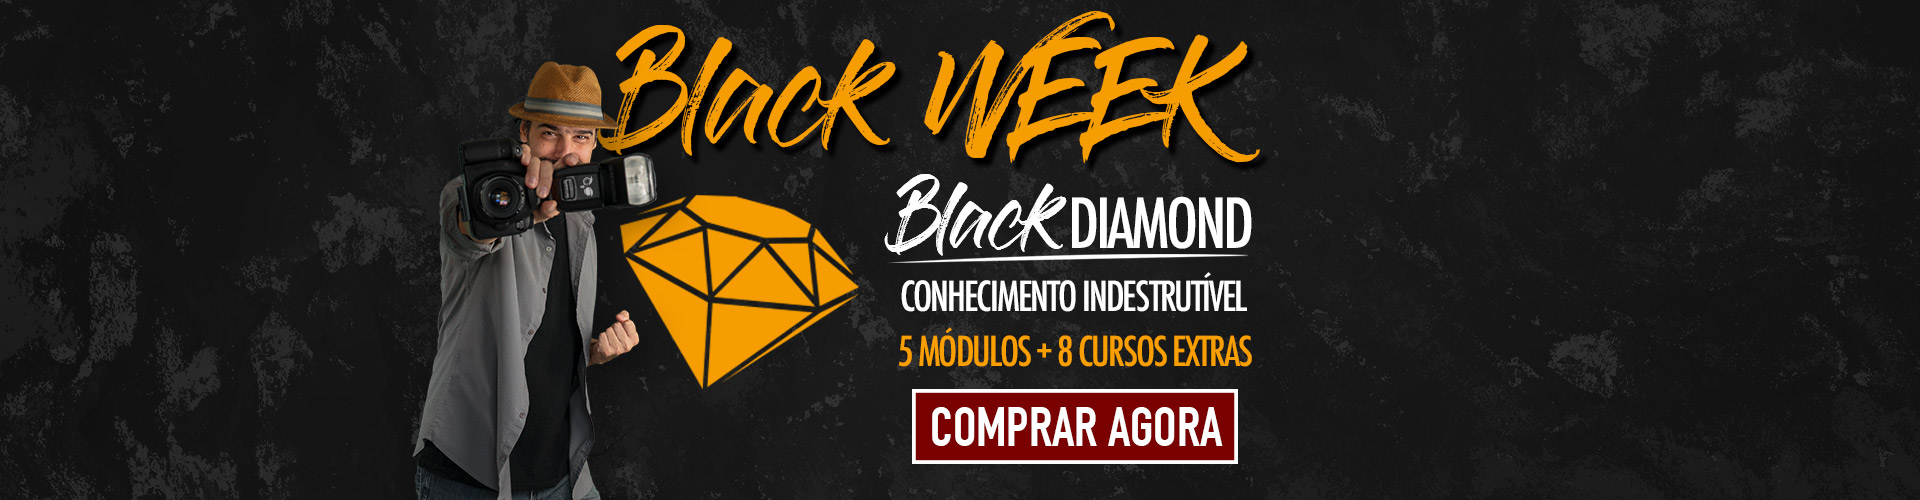 slider-black-friday-diamond